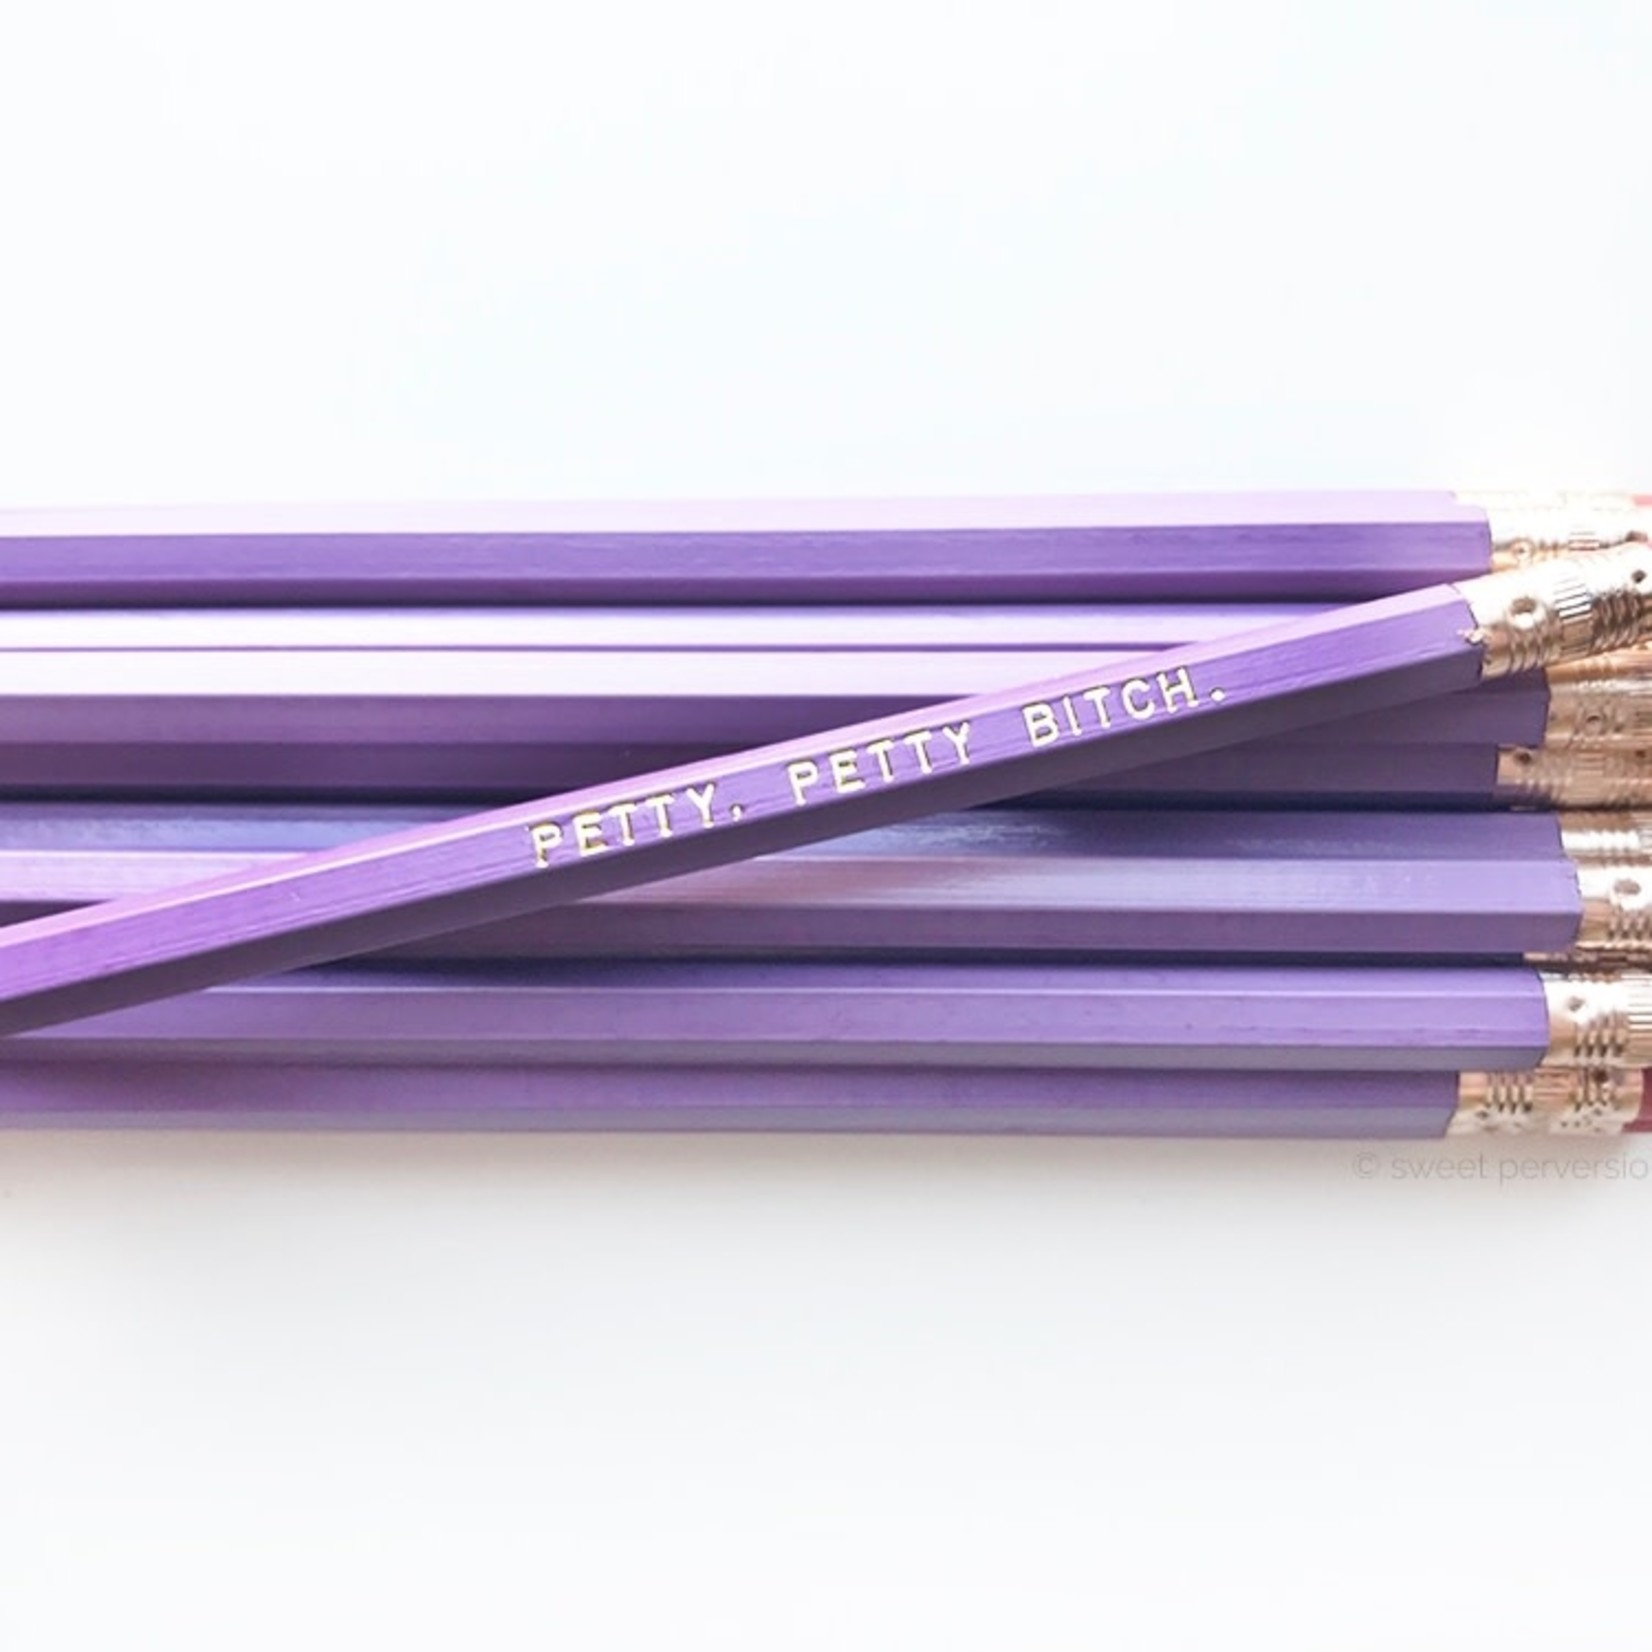 Sweet Perversion Sweet Perversion Pencil Blue